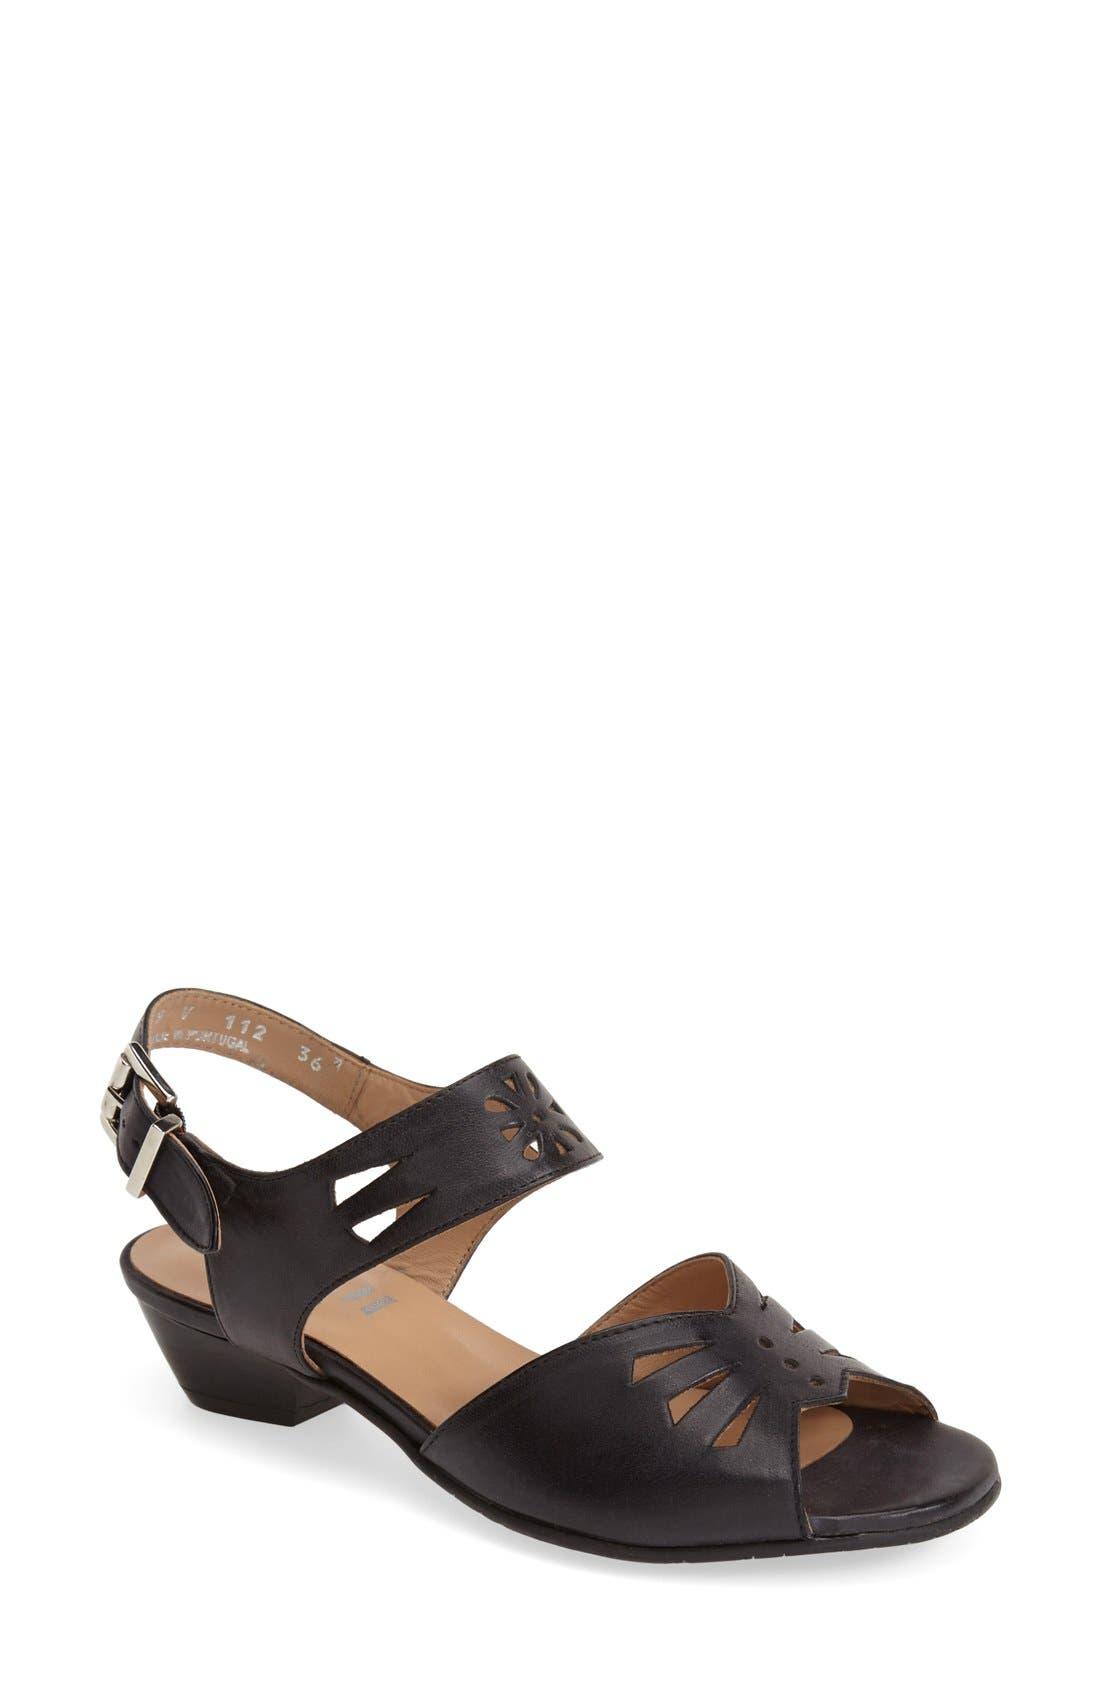 'V112' Perforated Leather Sandal,                         Main,                         color, Black